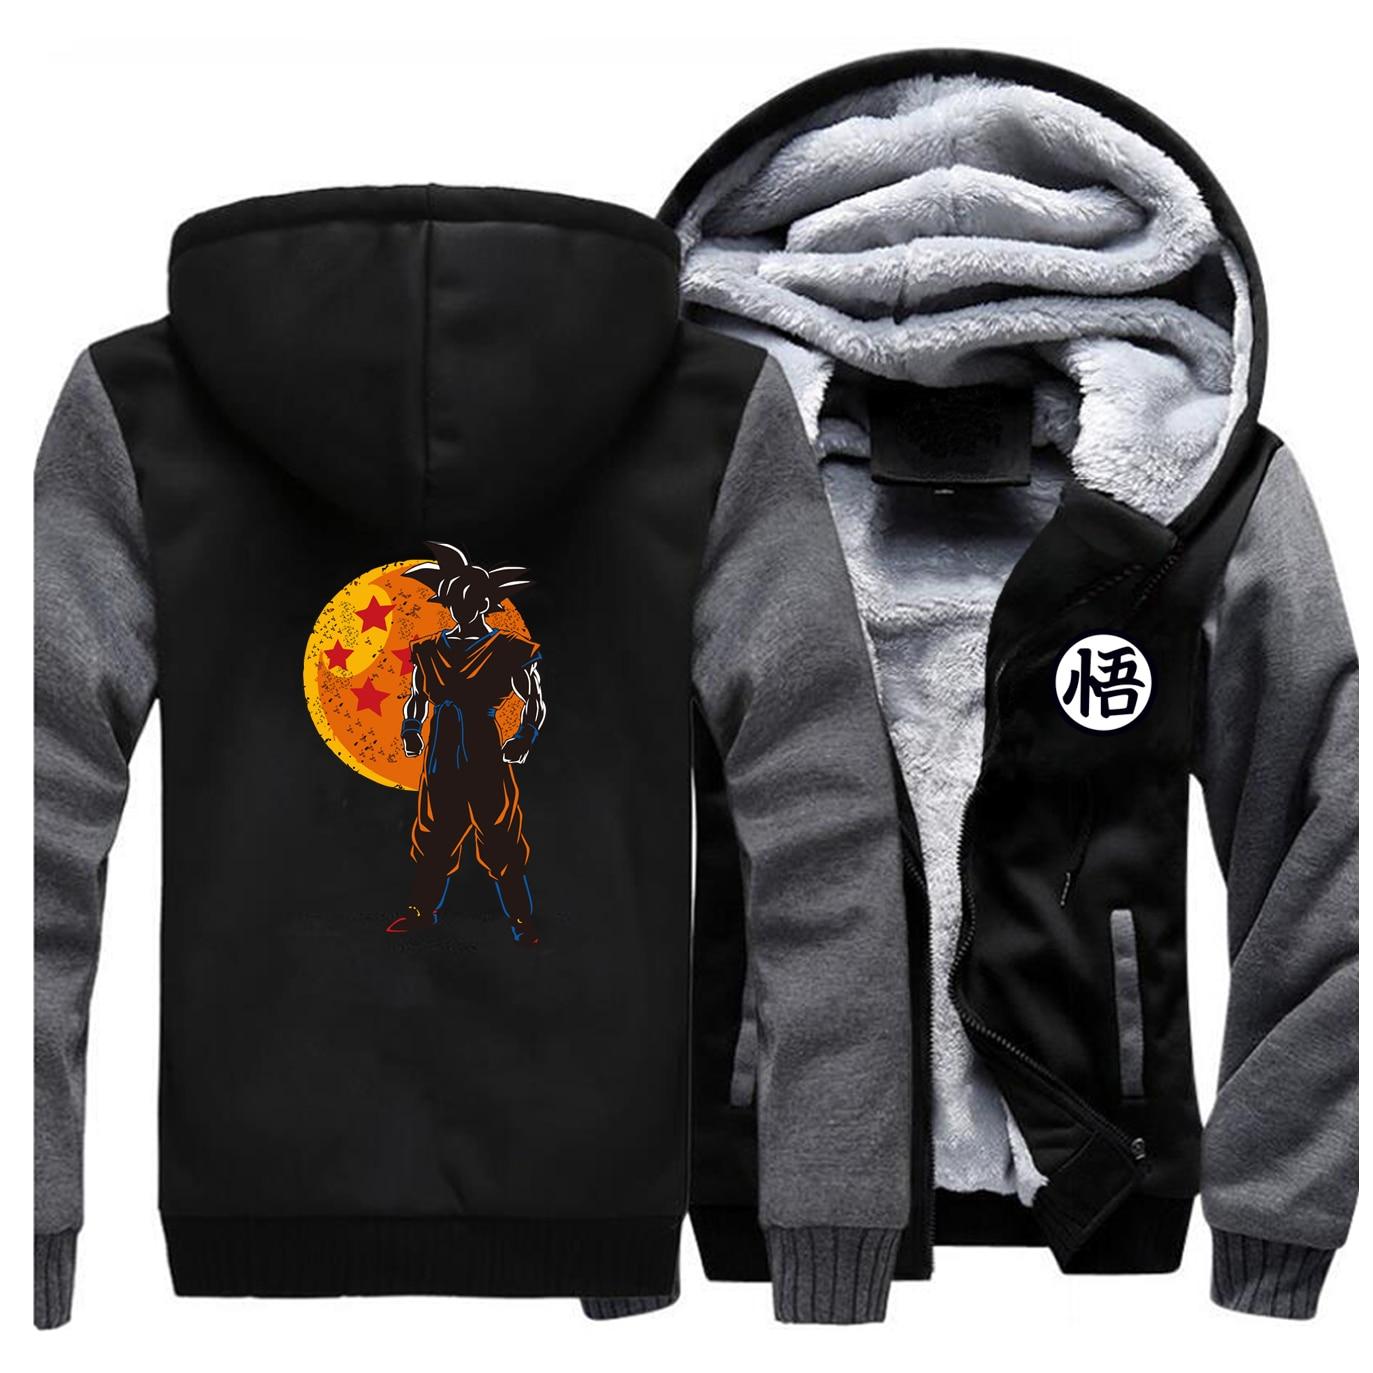 Dragon Ball Japanese Anime Jackets Sweatshirt Men Hoodies Zipper Winter Thick Fleece Coat Super   Harajuku Sportswear Mens